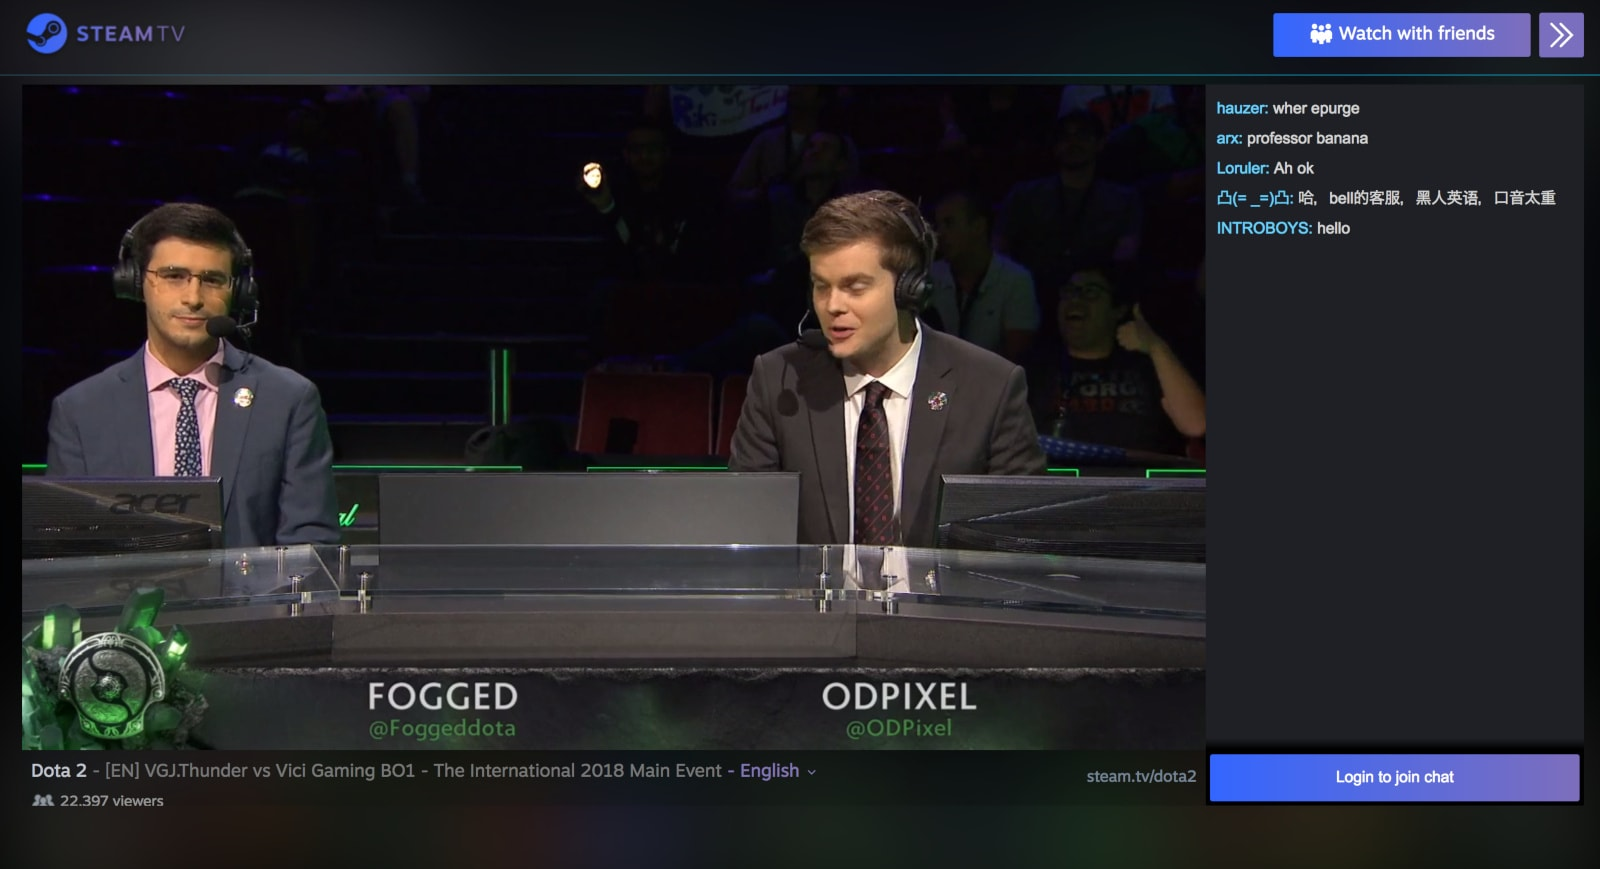 Steam TV goes live again to stream 'Dota 2' tournament